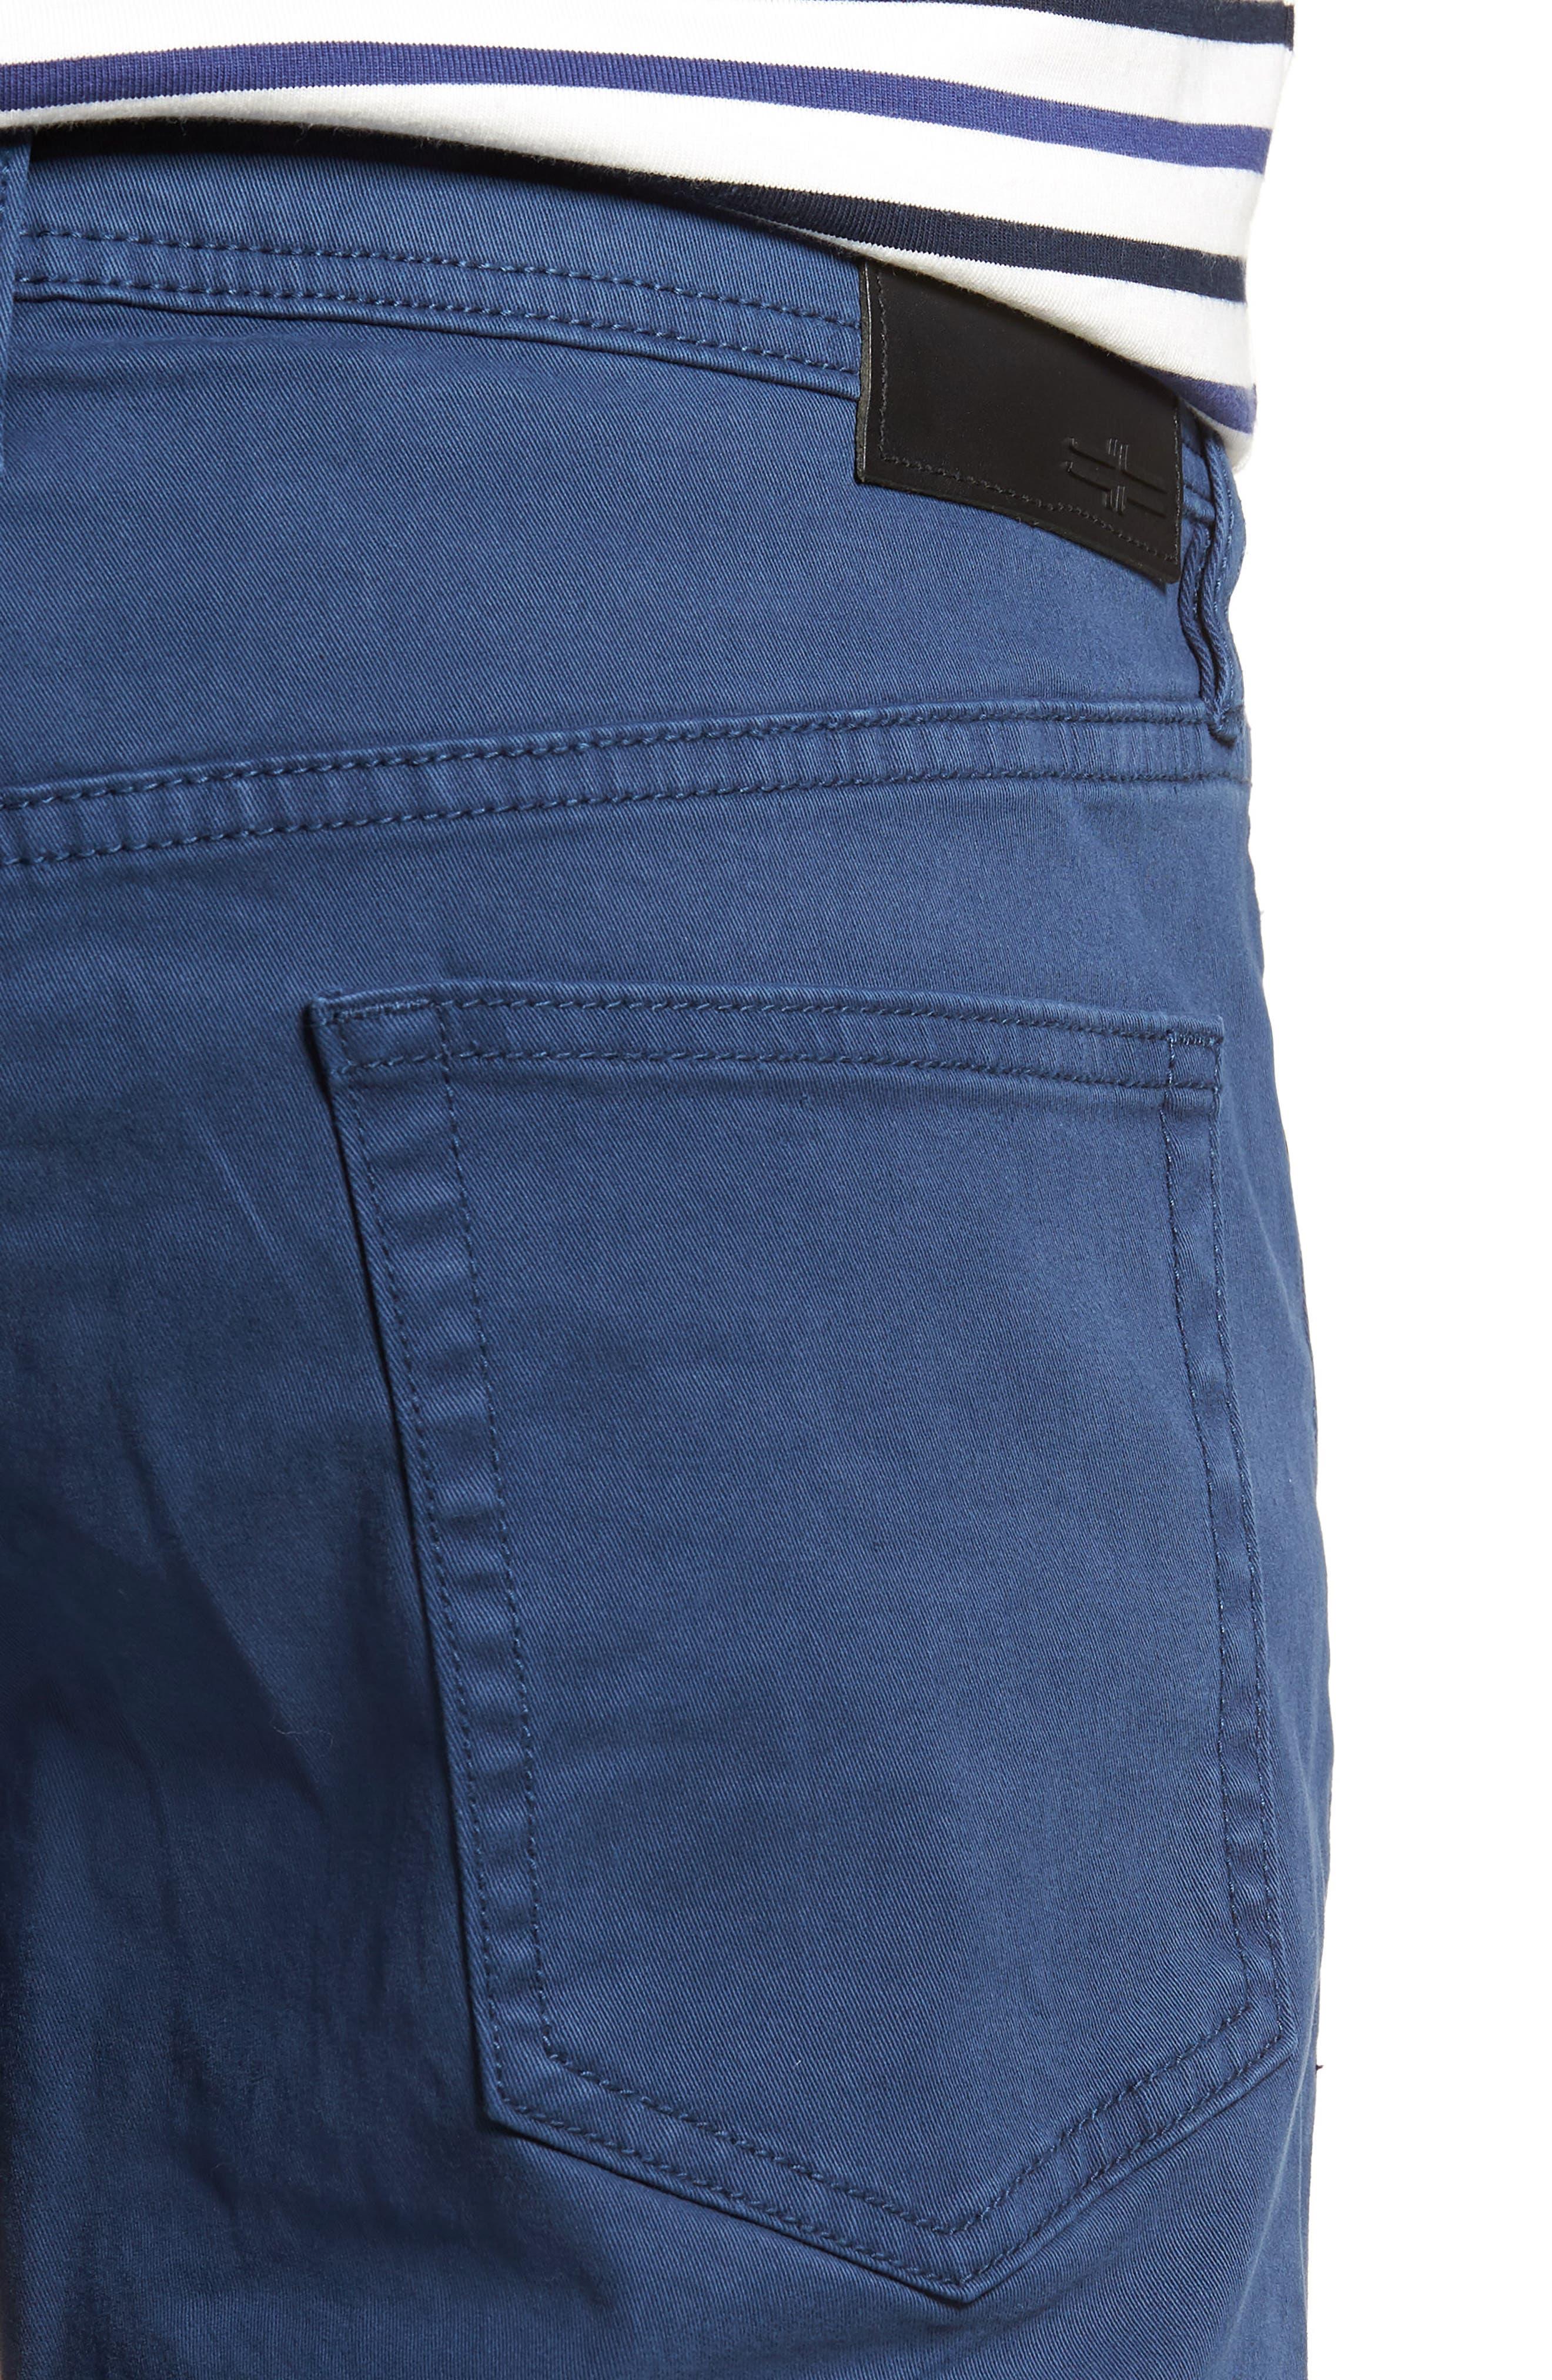 Jeans Co. Kingston Slim Straight Leg Jeans,                             Alternate thumbnail 4, color,                             BLUE TWILIGHT